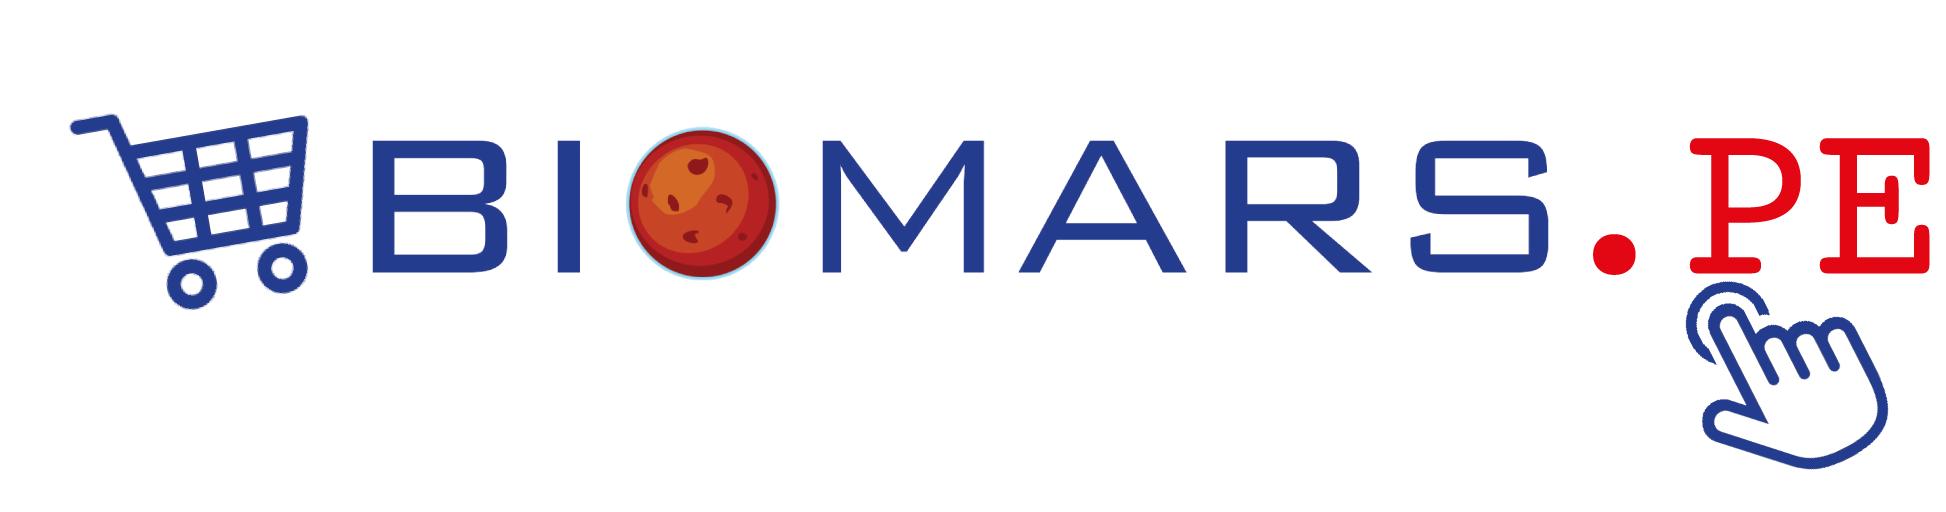 biomars